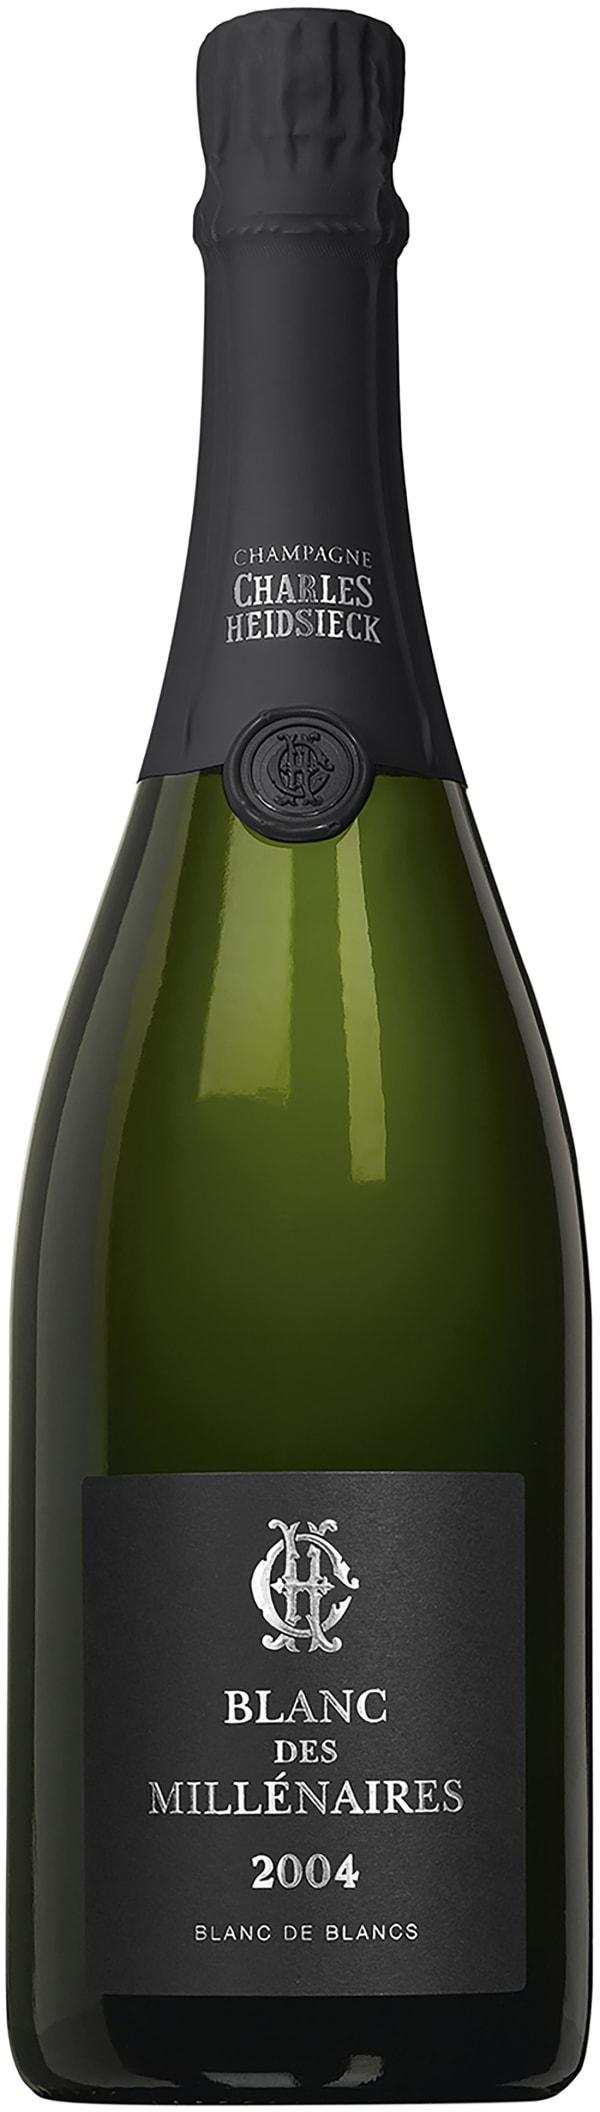 Charles Heidsieck Blanc des Millenaires Champagne Brut 1995